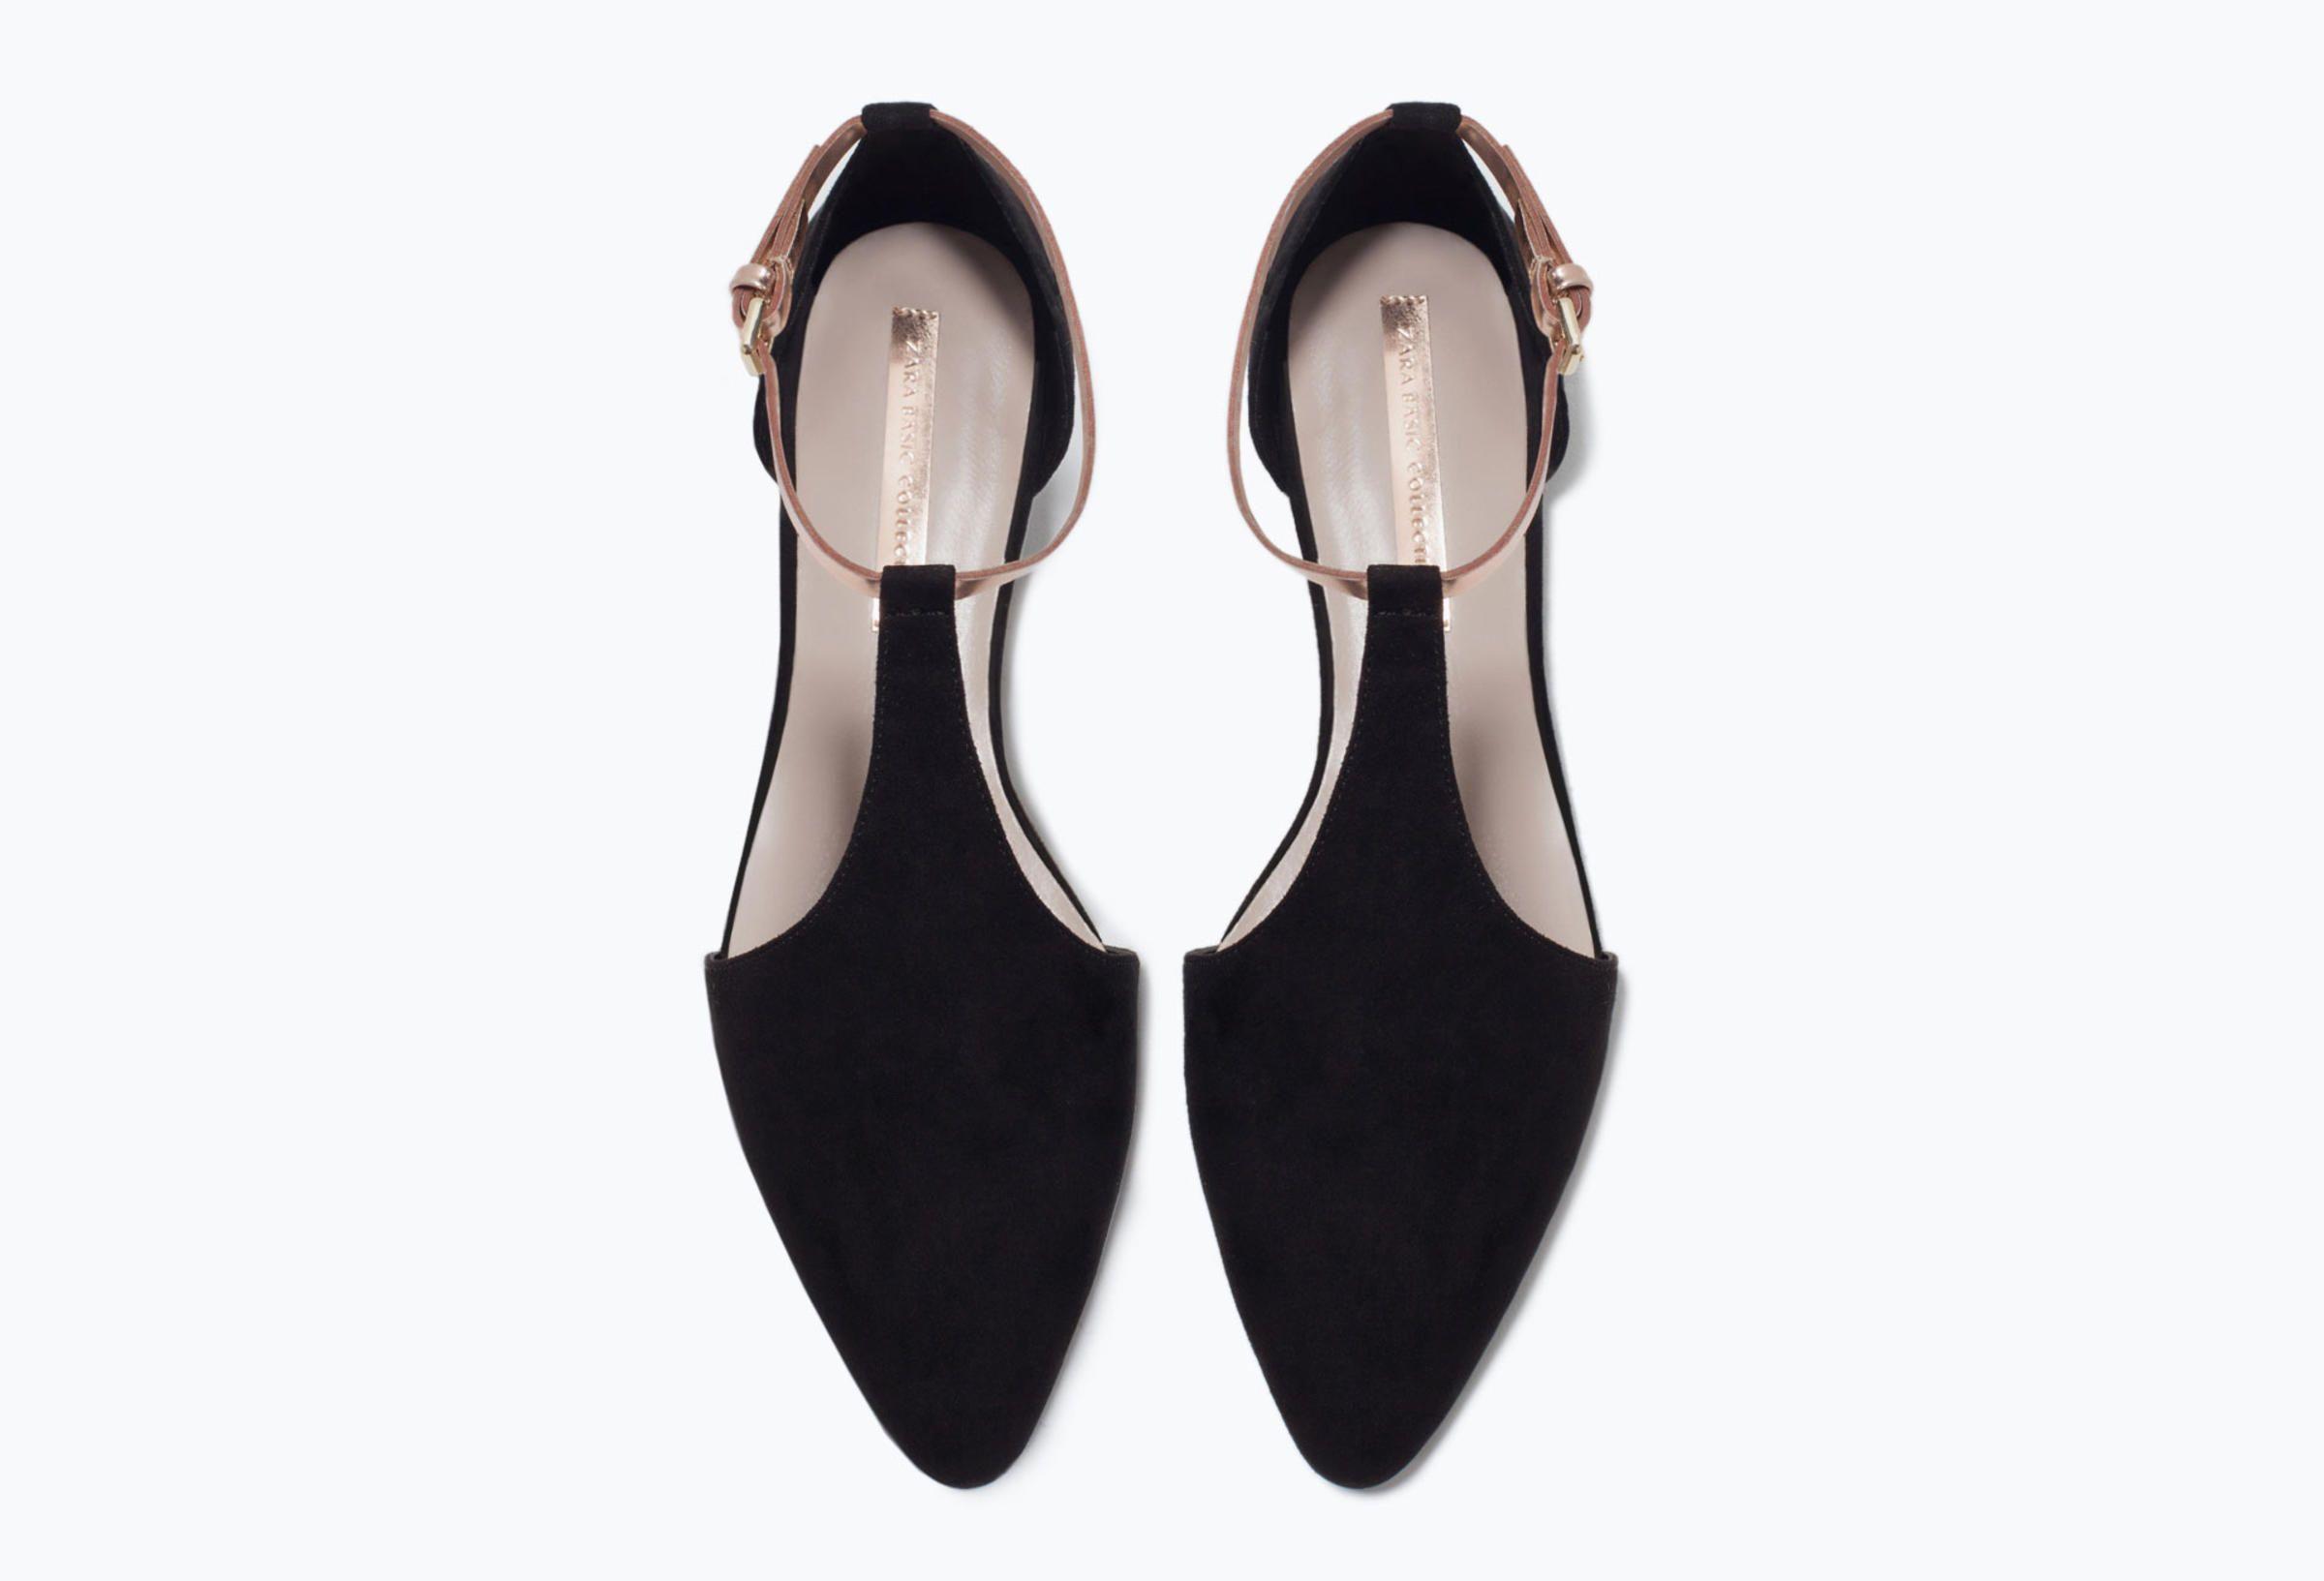 Tyler S Dressy Black Flats Ankle Strap Flats Dressy Black Flats Dressy Flats Shoes